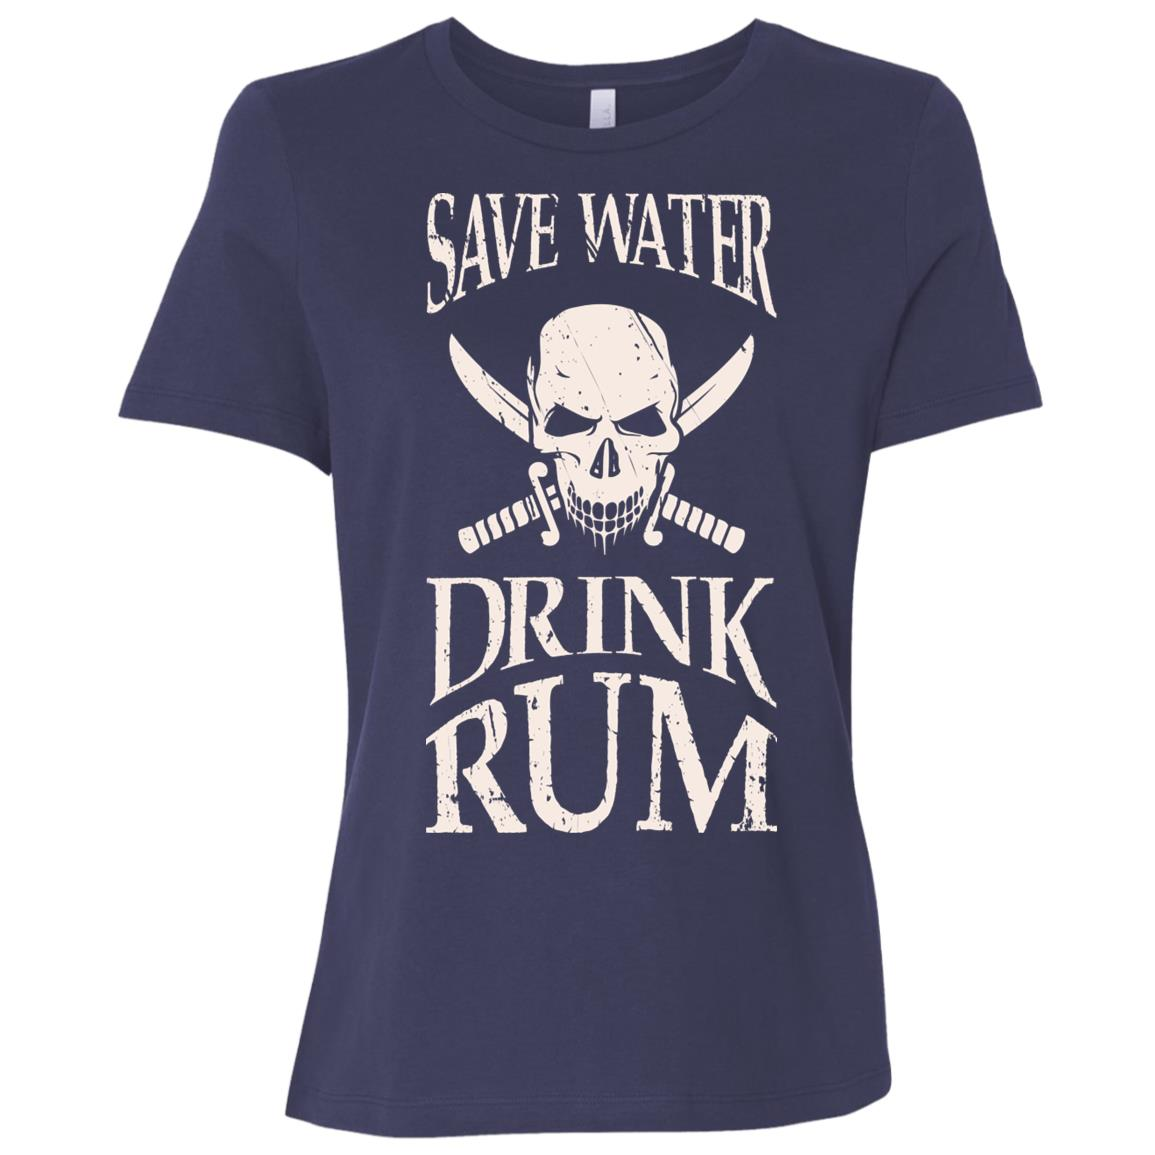 Save Water Drink Rum, Buccaneer Pirate Women Short Sleeve T-Shirt